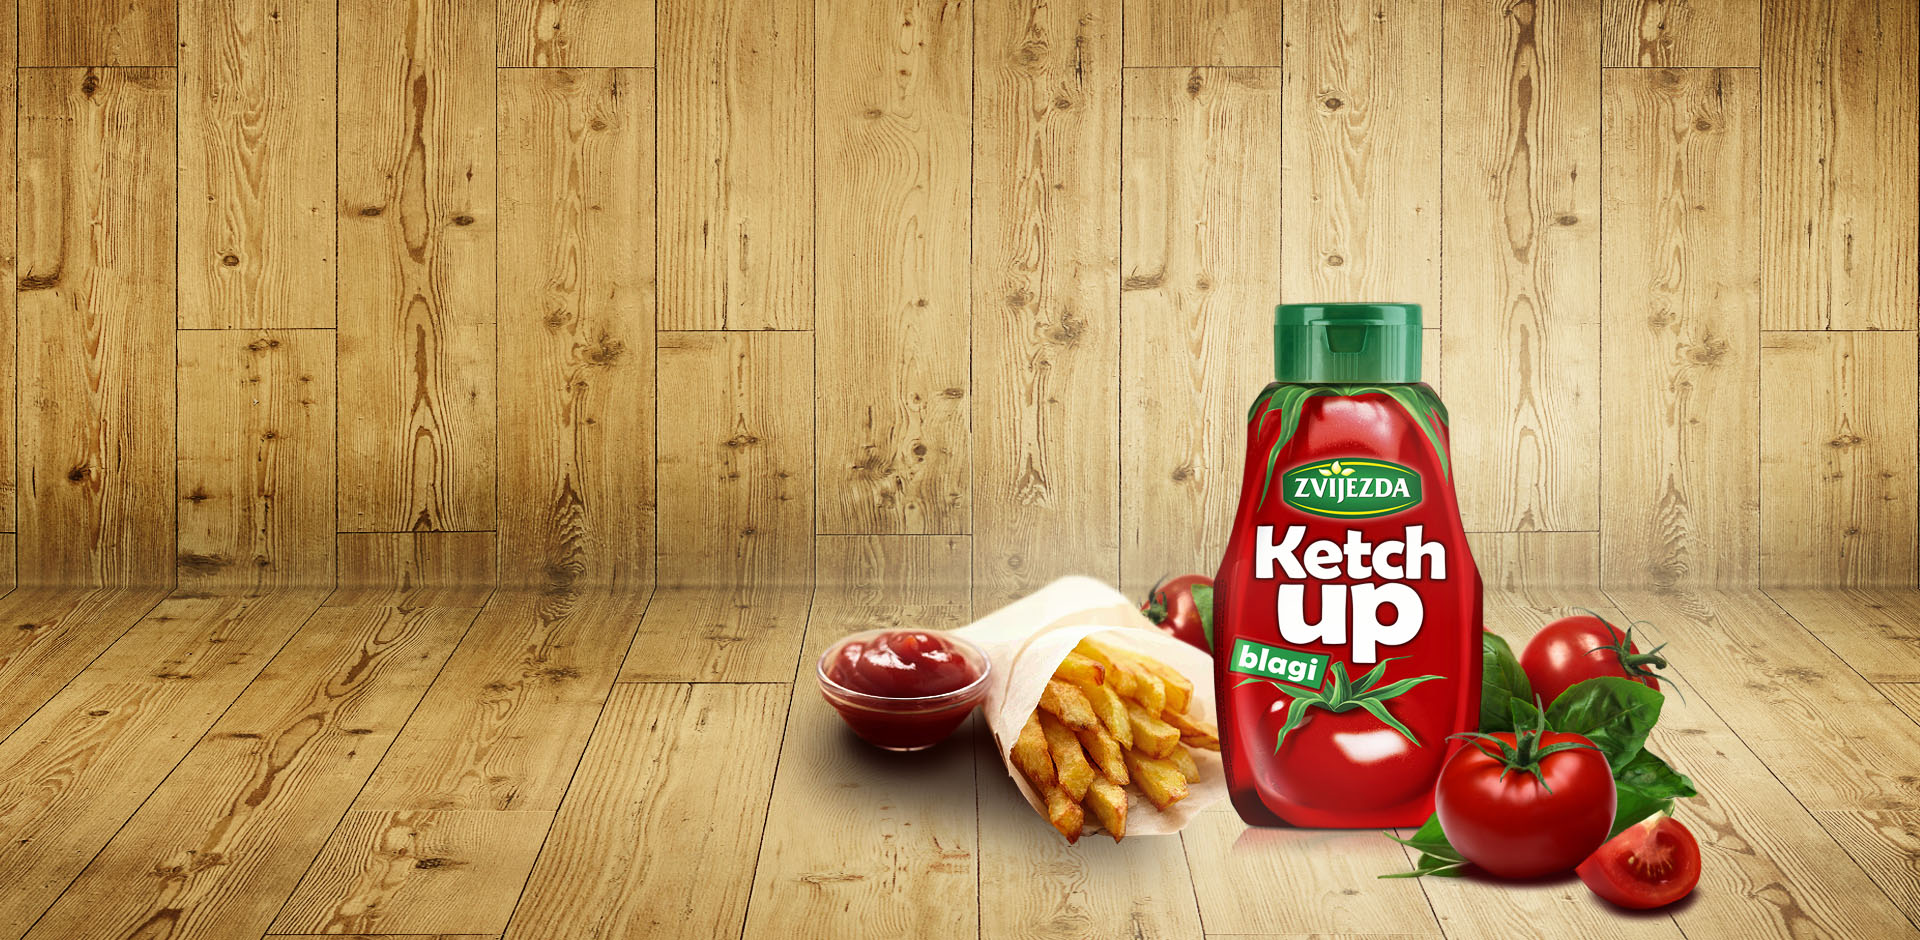 zvijezda-slider-ketchup